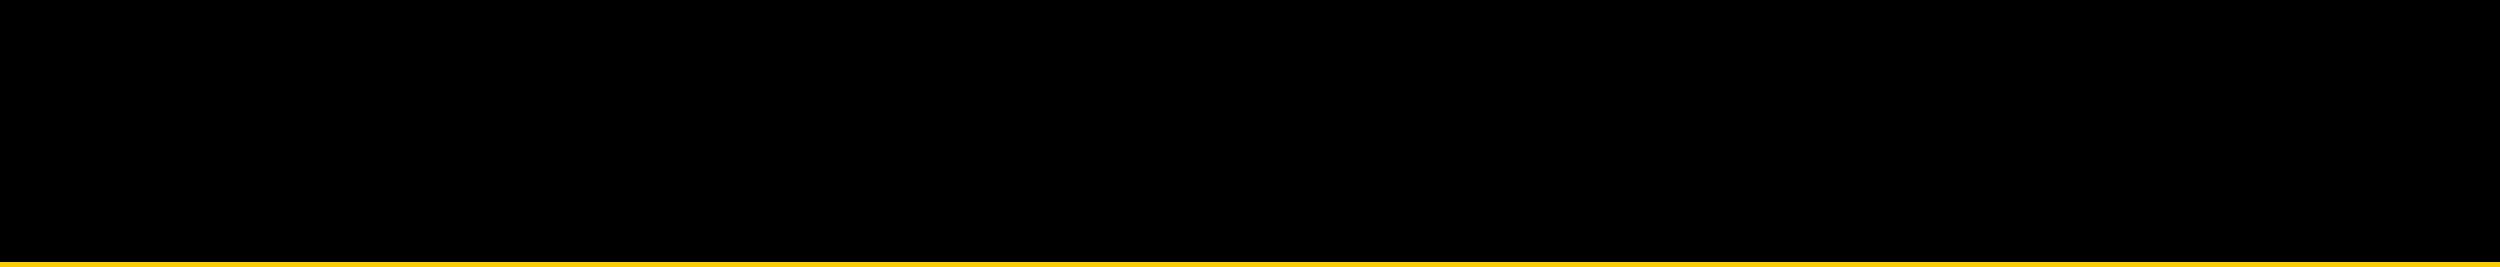 tangier-island-titles2.png